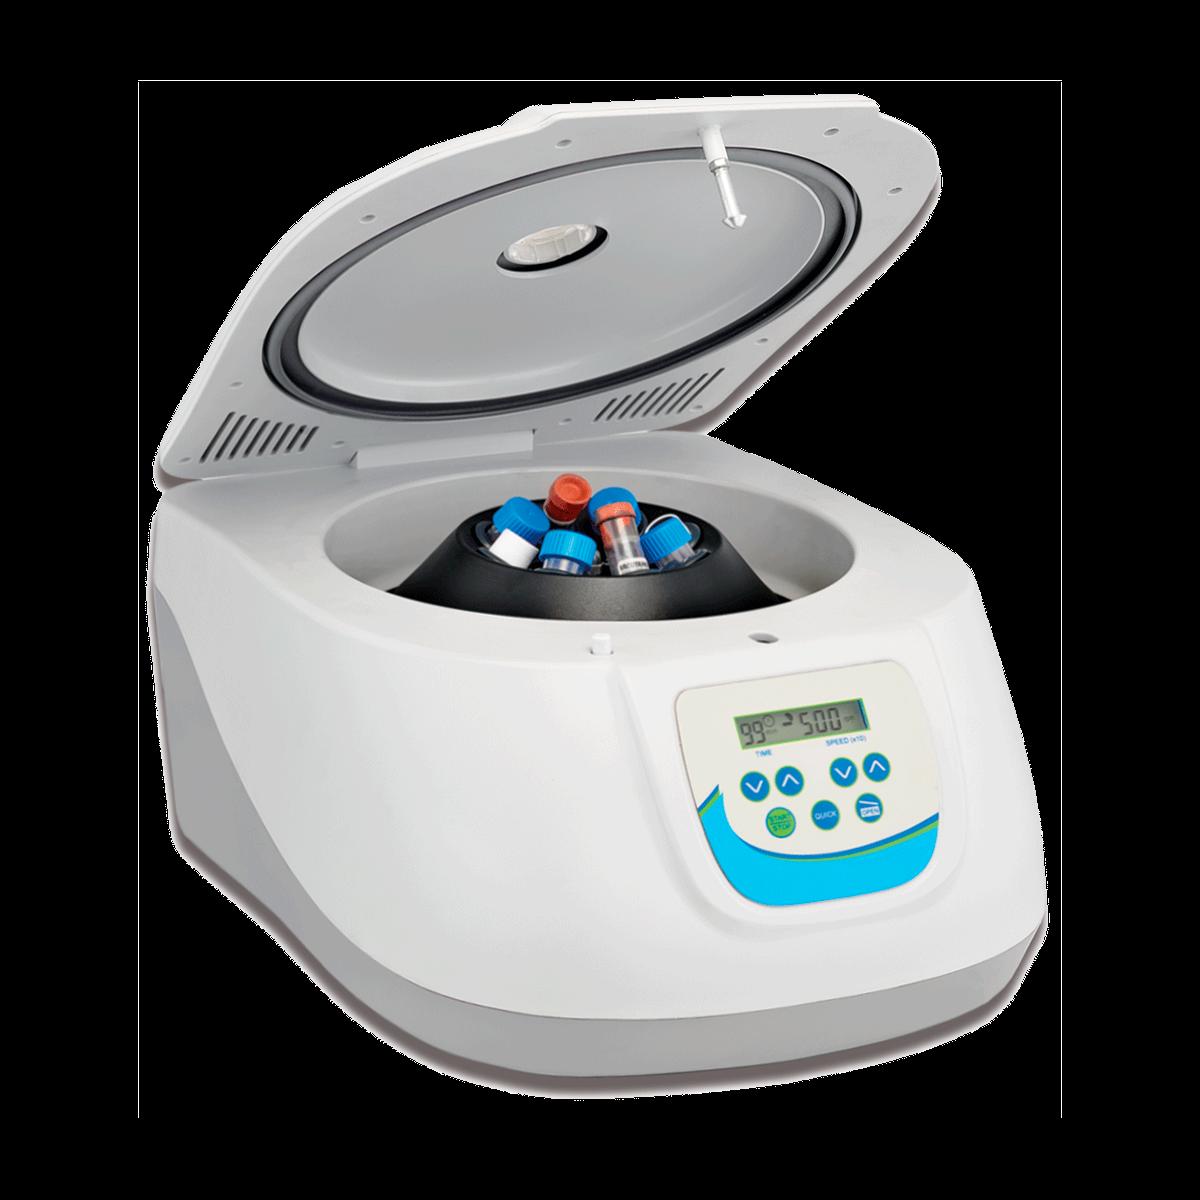 Test tube centrifuge